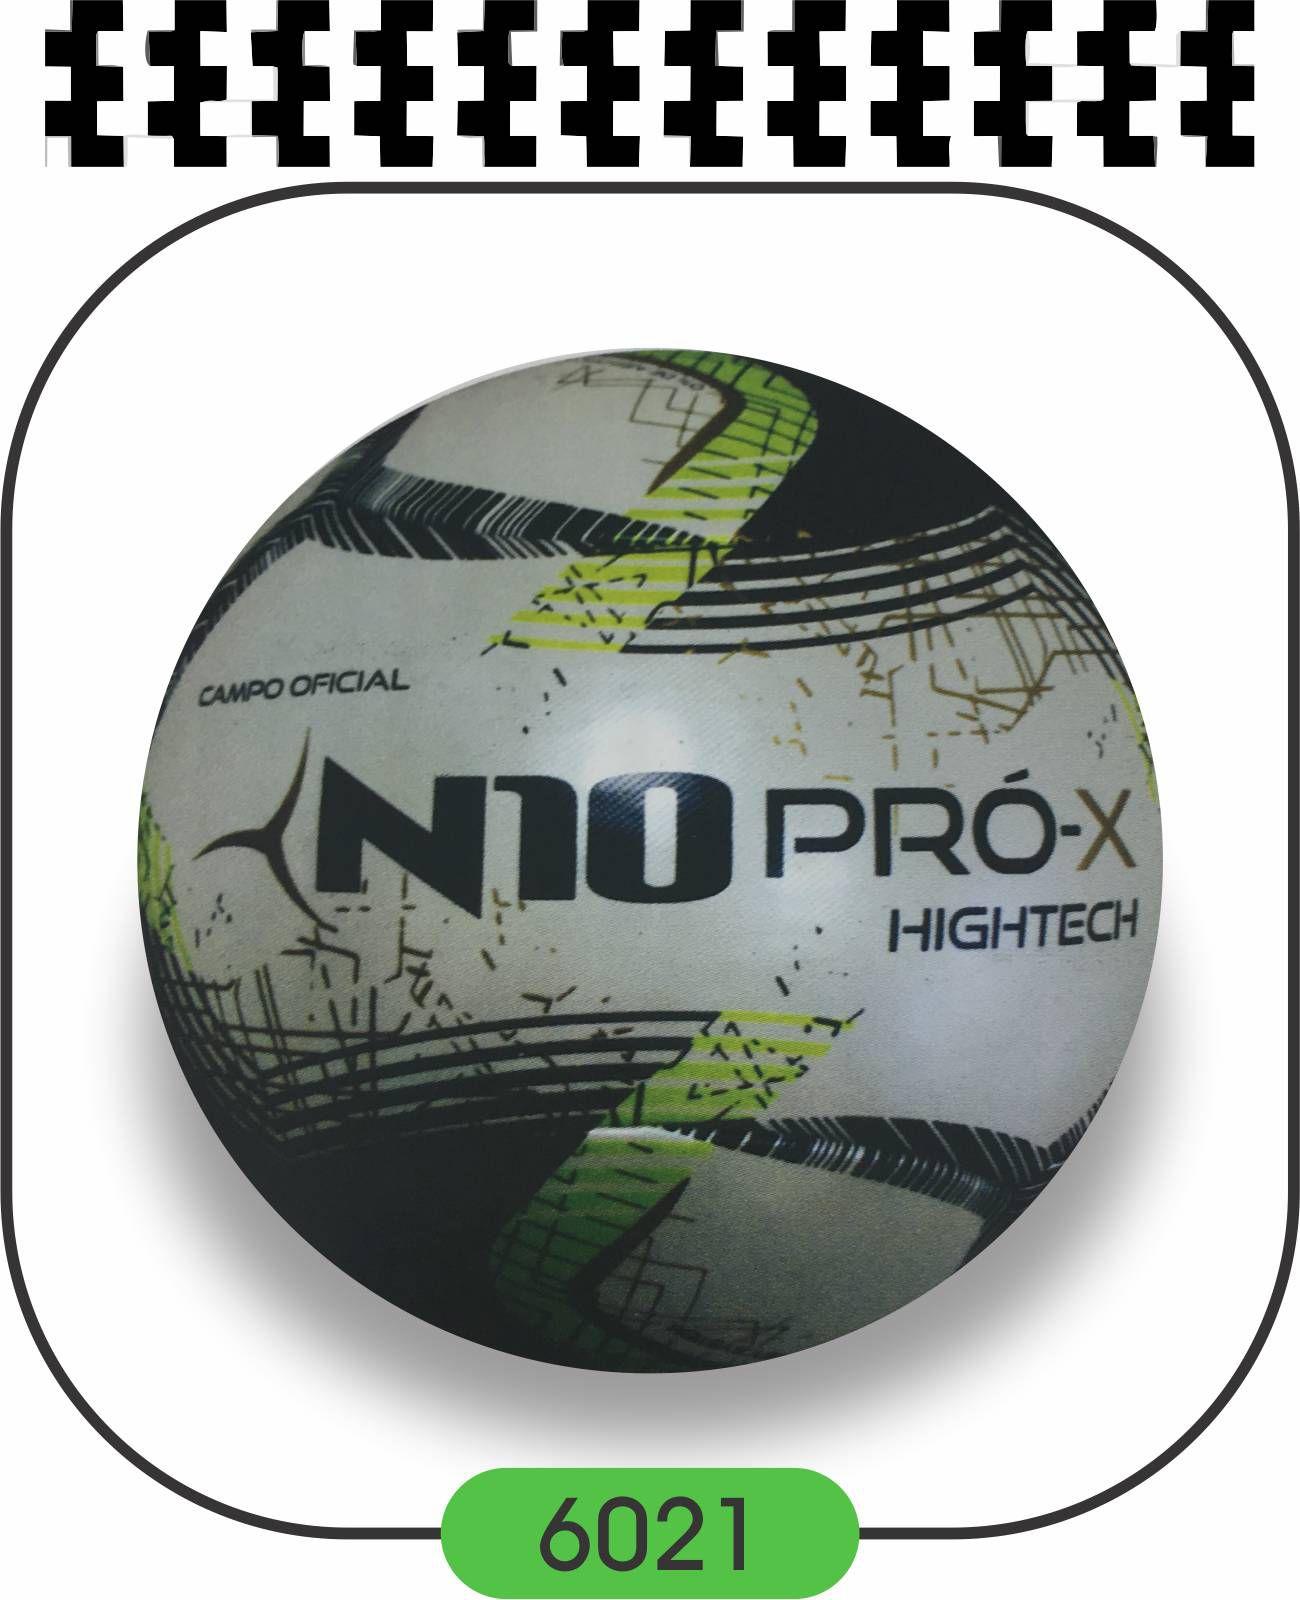 Bola de Futebol Society N10 PRO-X HIGHTECH - TERMOFUSY  - Bolas Lassabia - Bolas e Brindes Personalizados